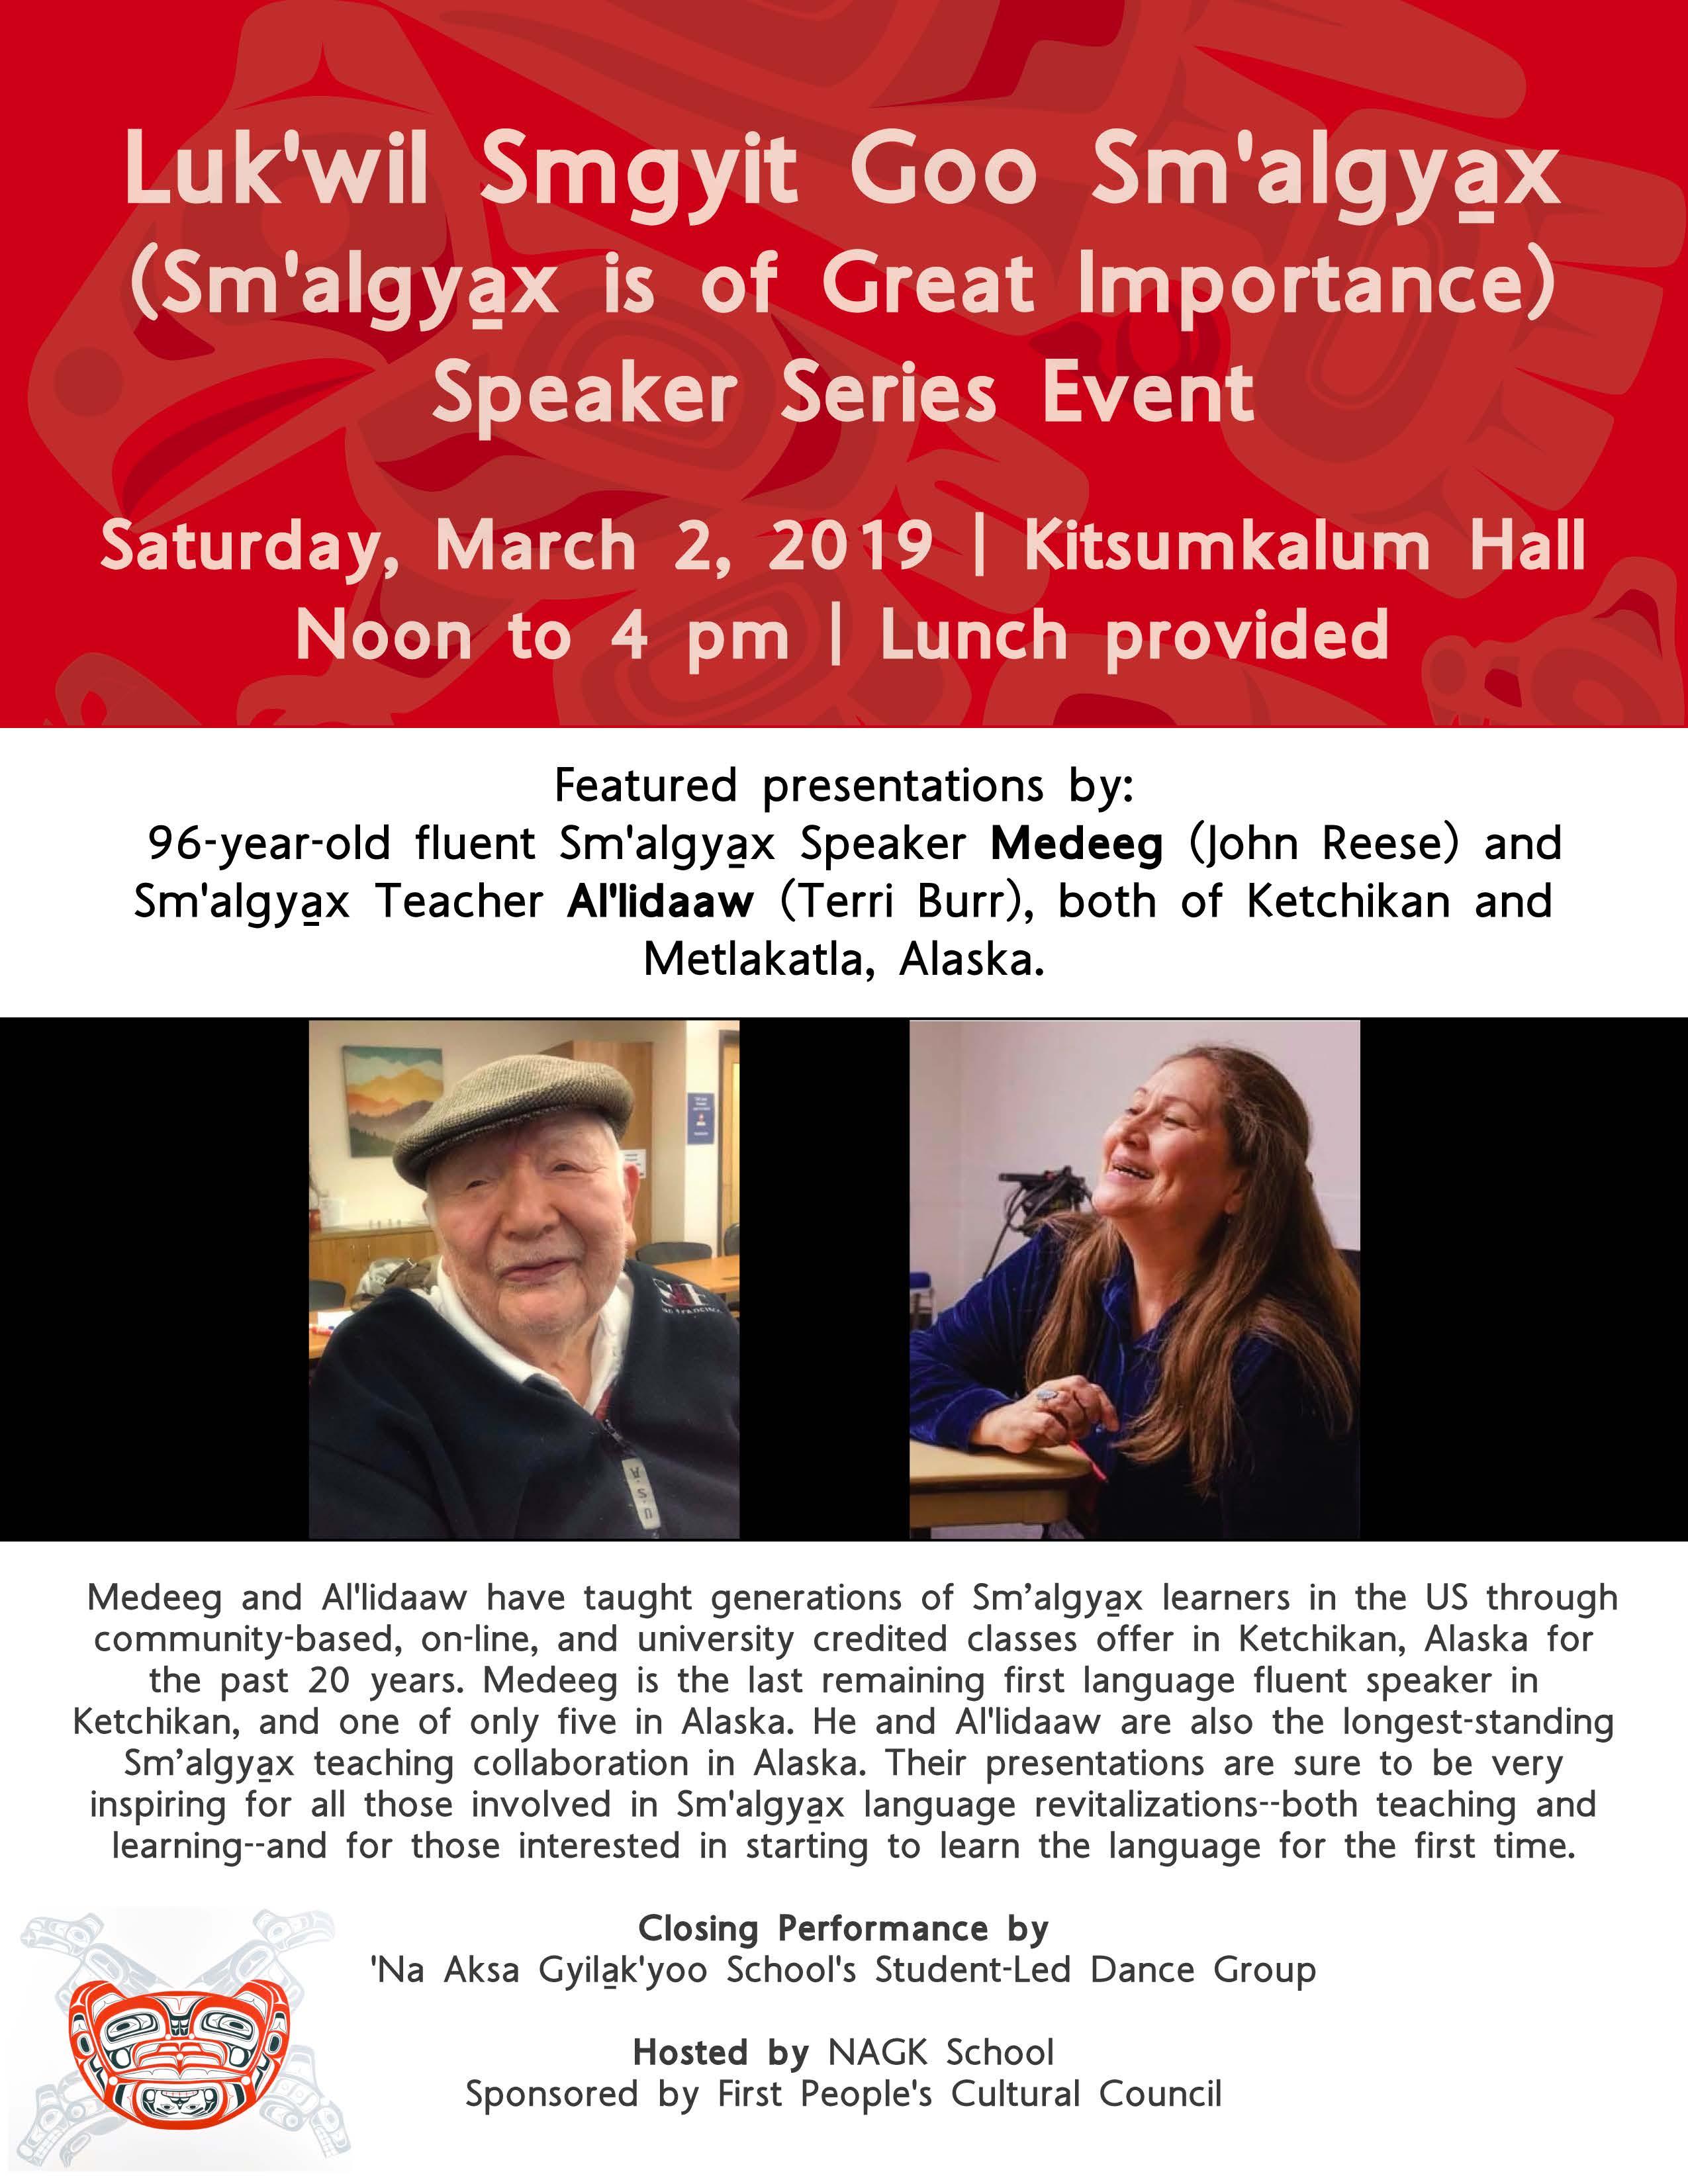 Luk'wil Smgyit Goo Sm'algya̱x Speaker Series Event